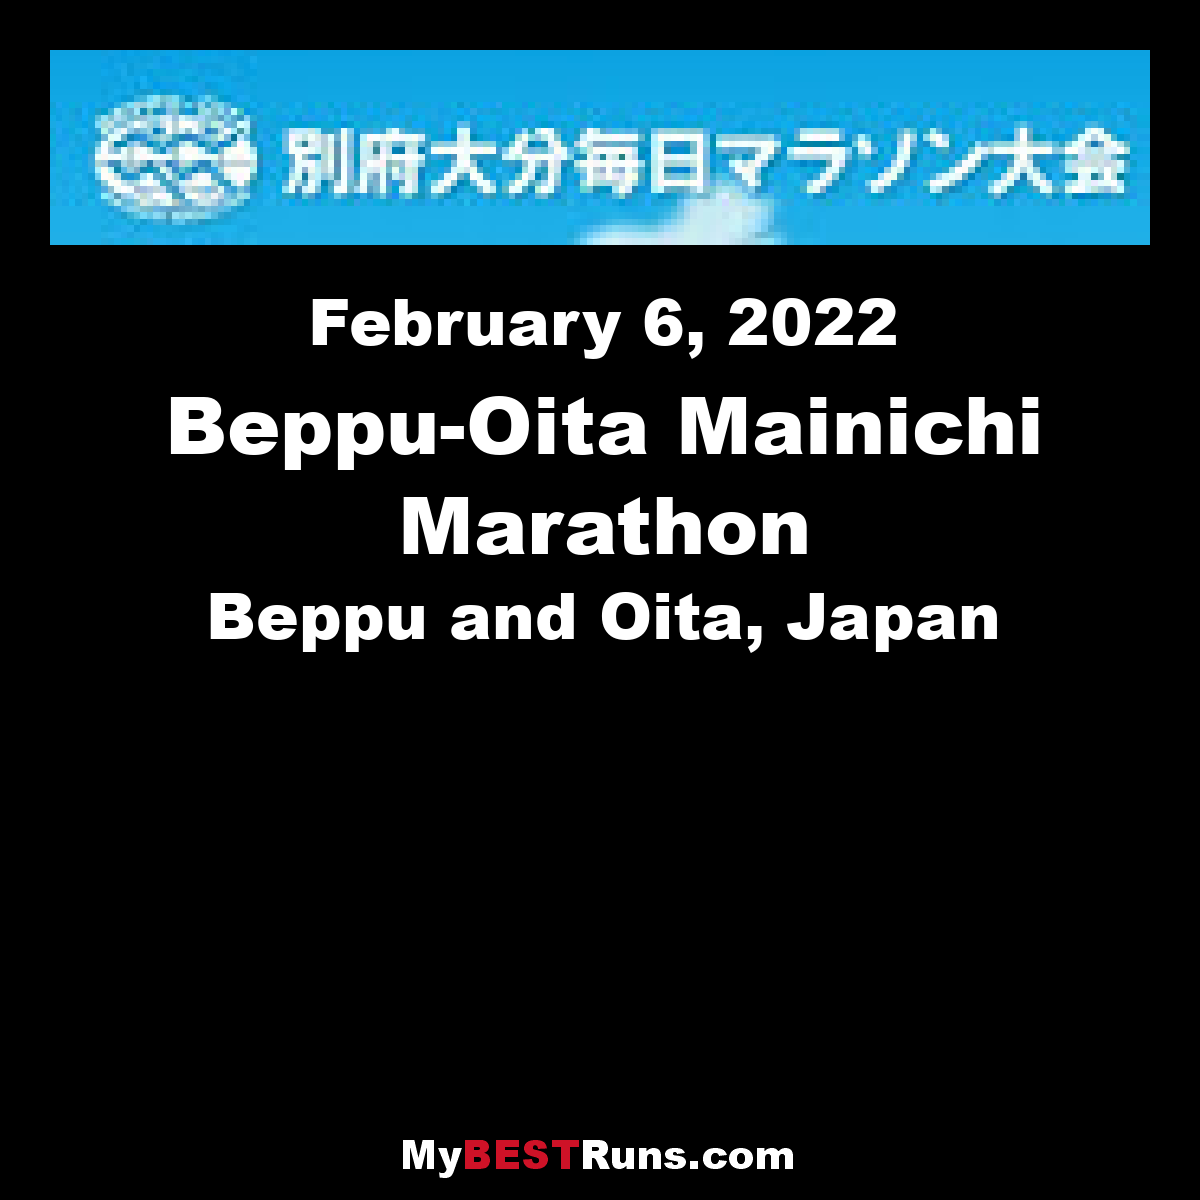 Beppu-Oita Mainichi Marathon